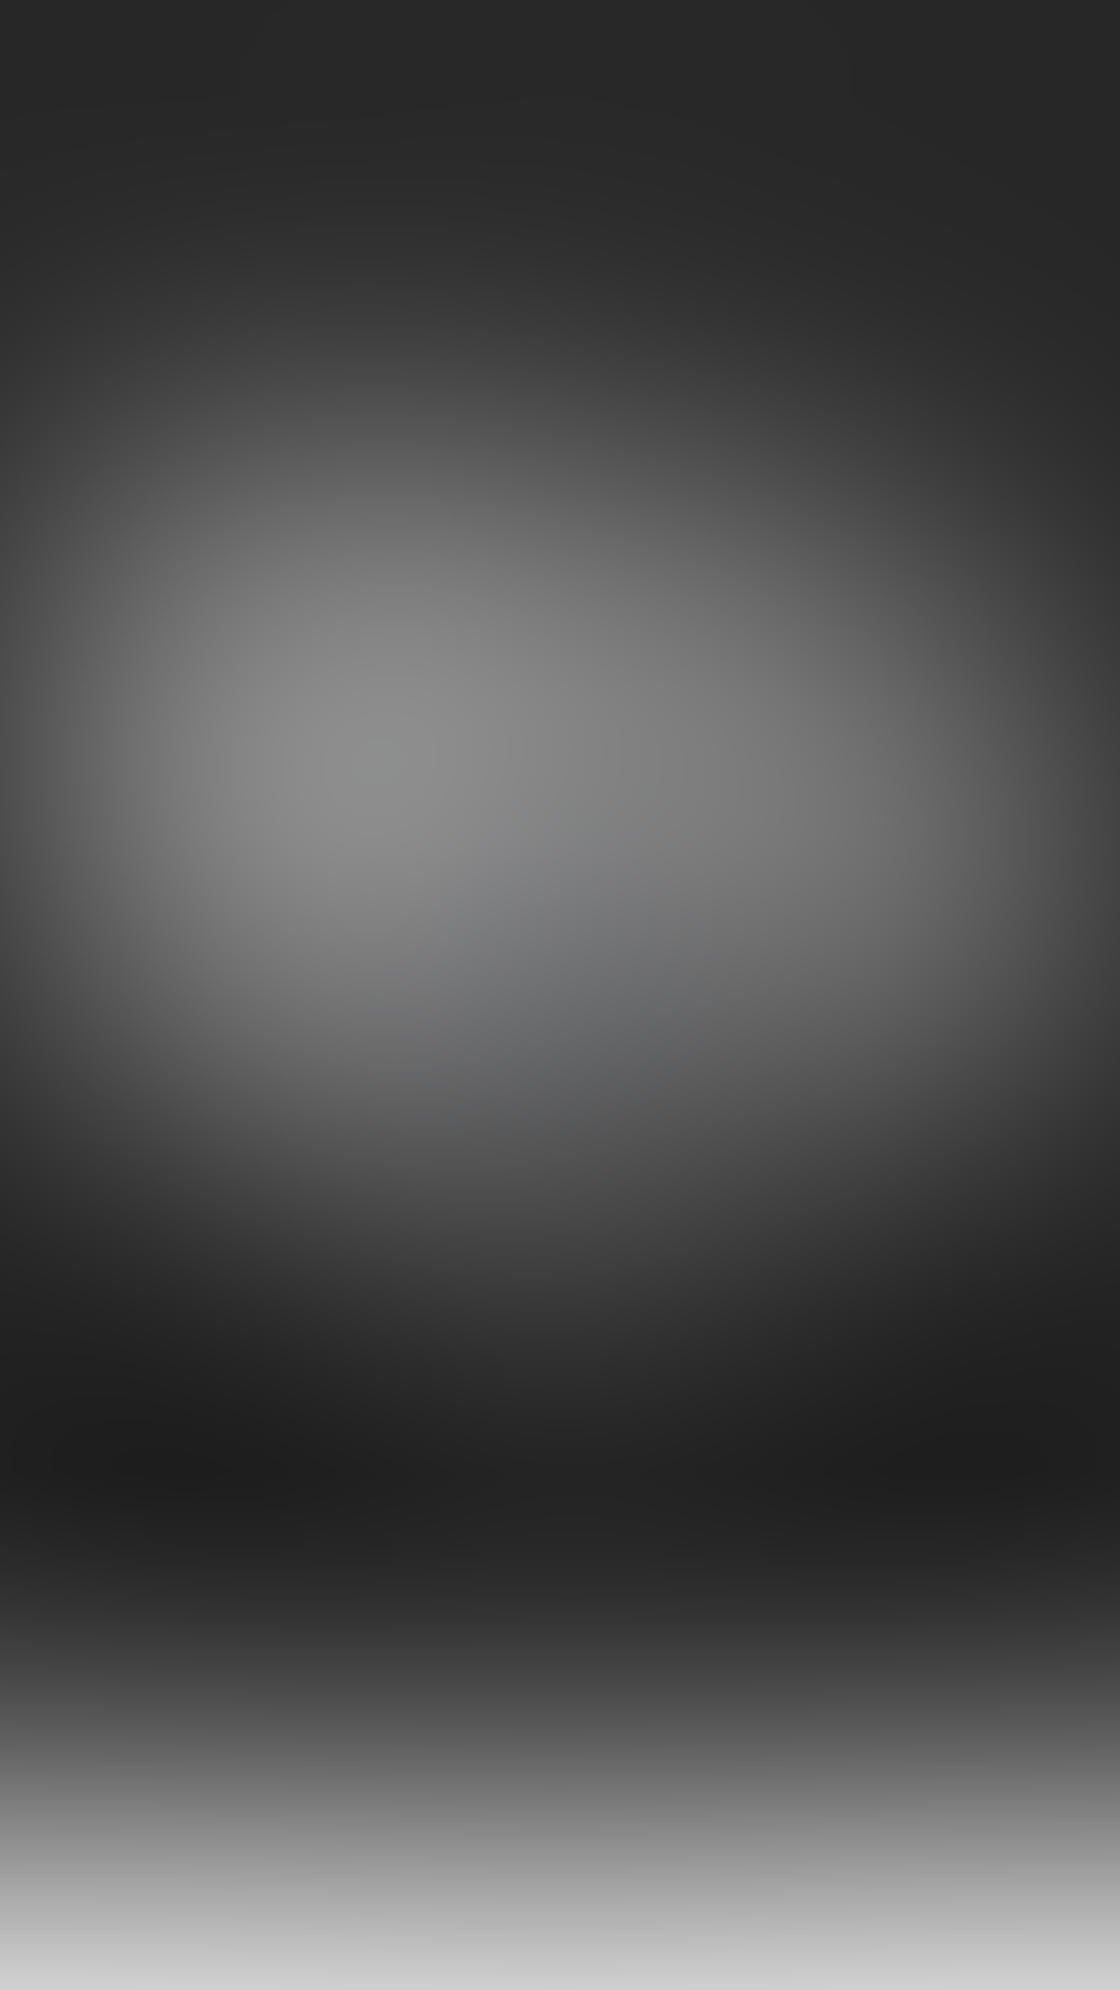 iPhone Photo Vignette 2